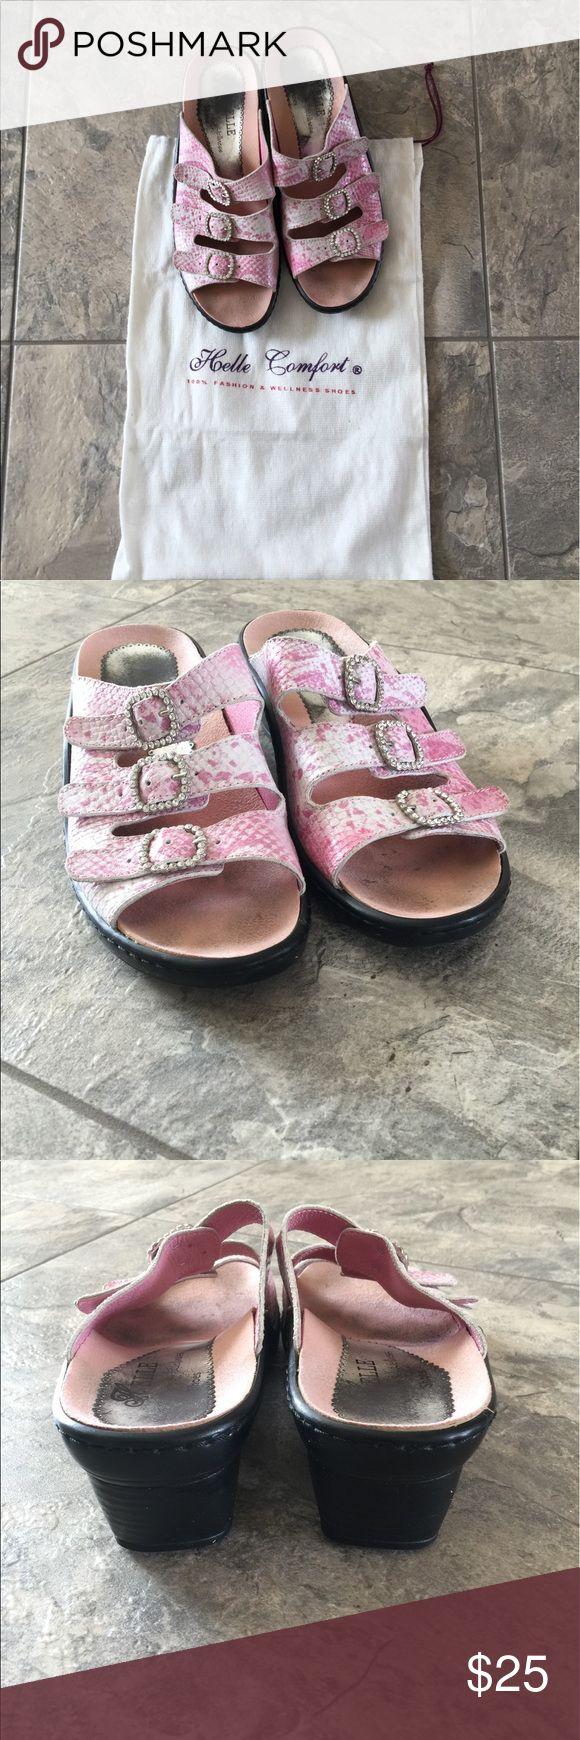 European sandals shoes - Helle Comfort Shoes Pink Bling Sandals European Size 37 I Am A 6 1